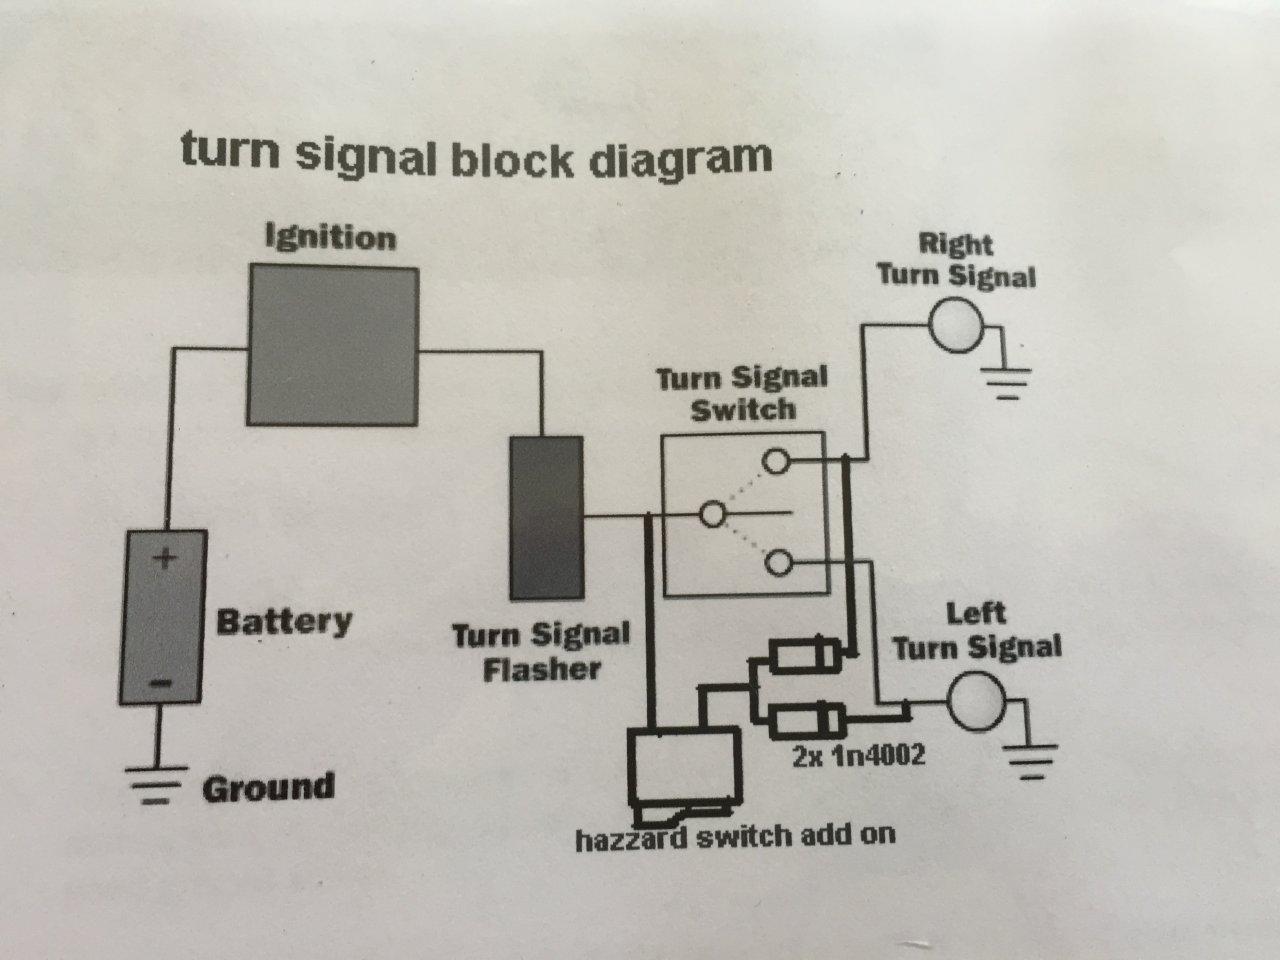 carling hazard switch wiring diagram wiring diagram mud uk carling hazard switch ion defender source